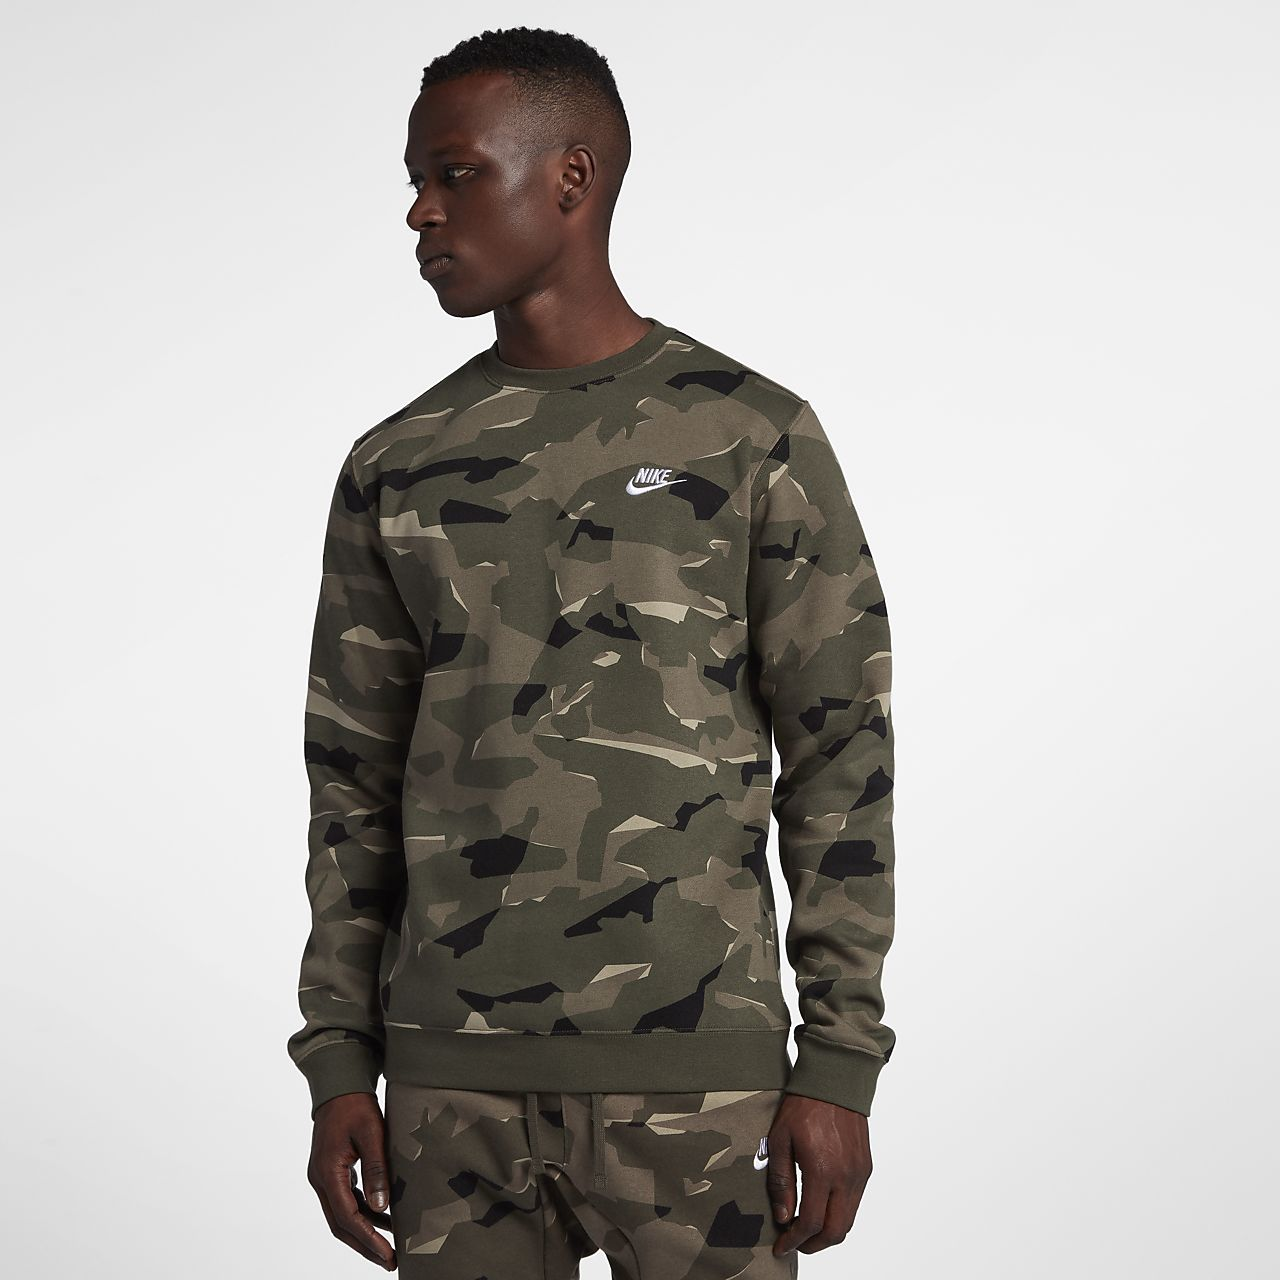 Nike Sportswear 50 Camuflaje De A Hombre Club Sudadera zPqzwaA